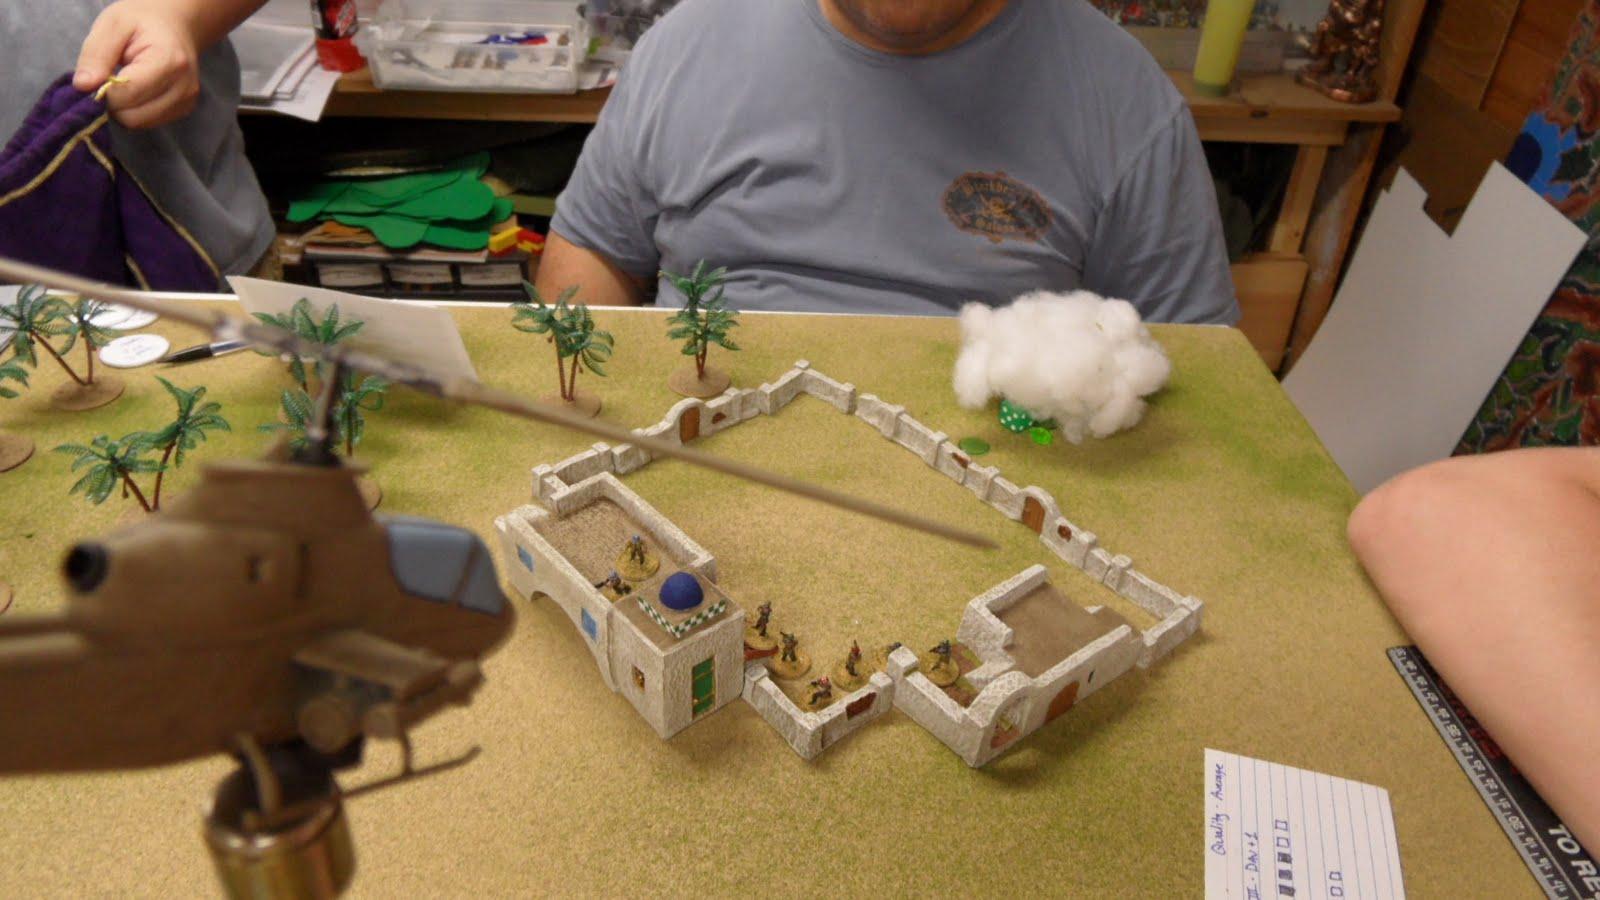 A Cobra gunship takes the compound under fire